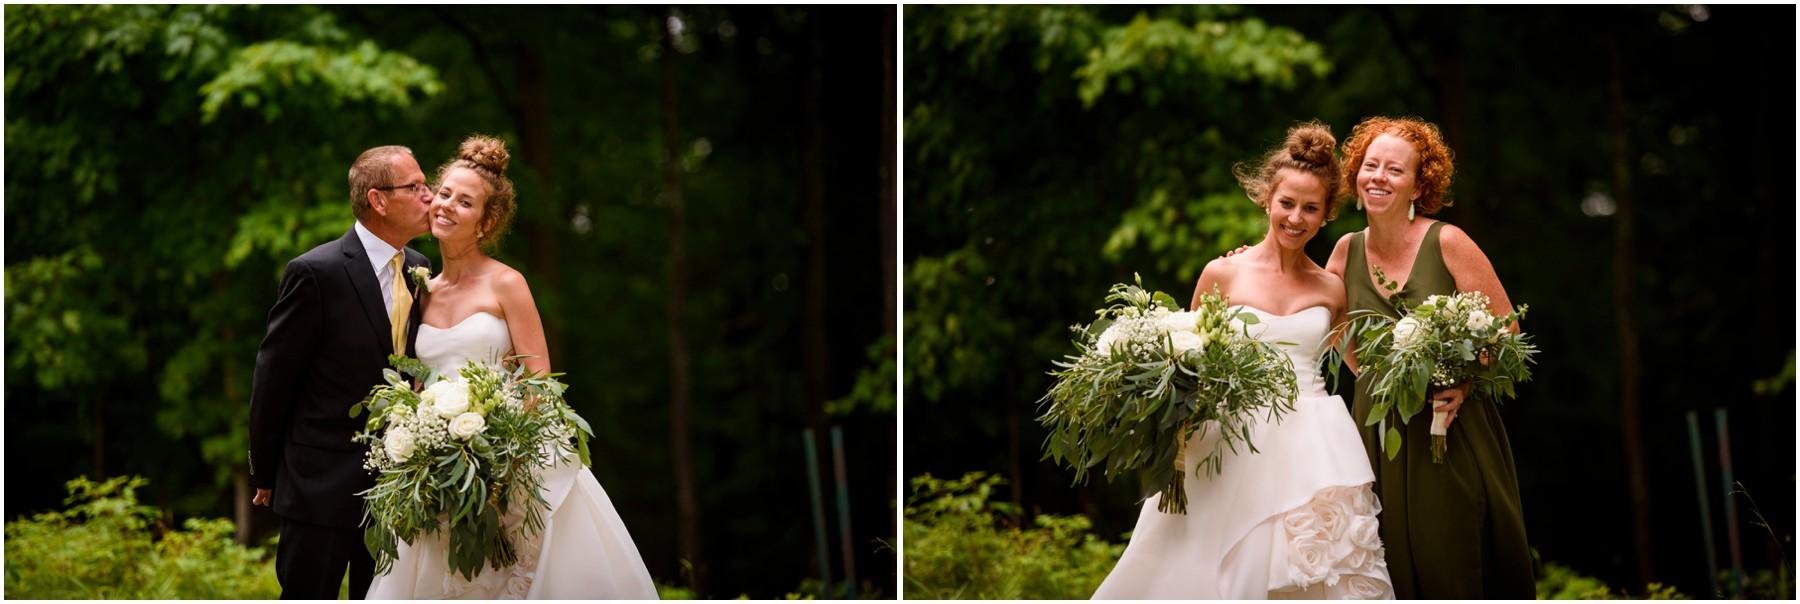 Wisconsin-north-woods-summer-lake-wedding_0100.jpg